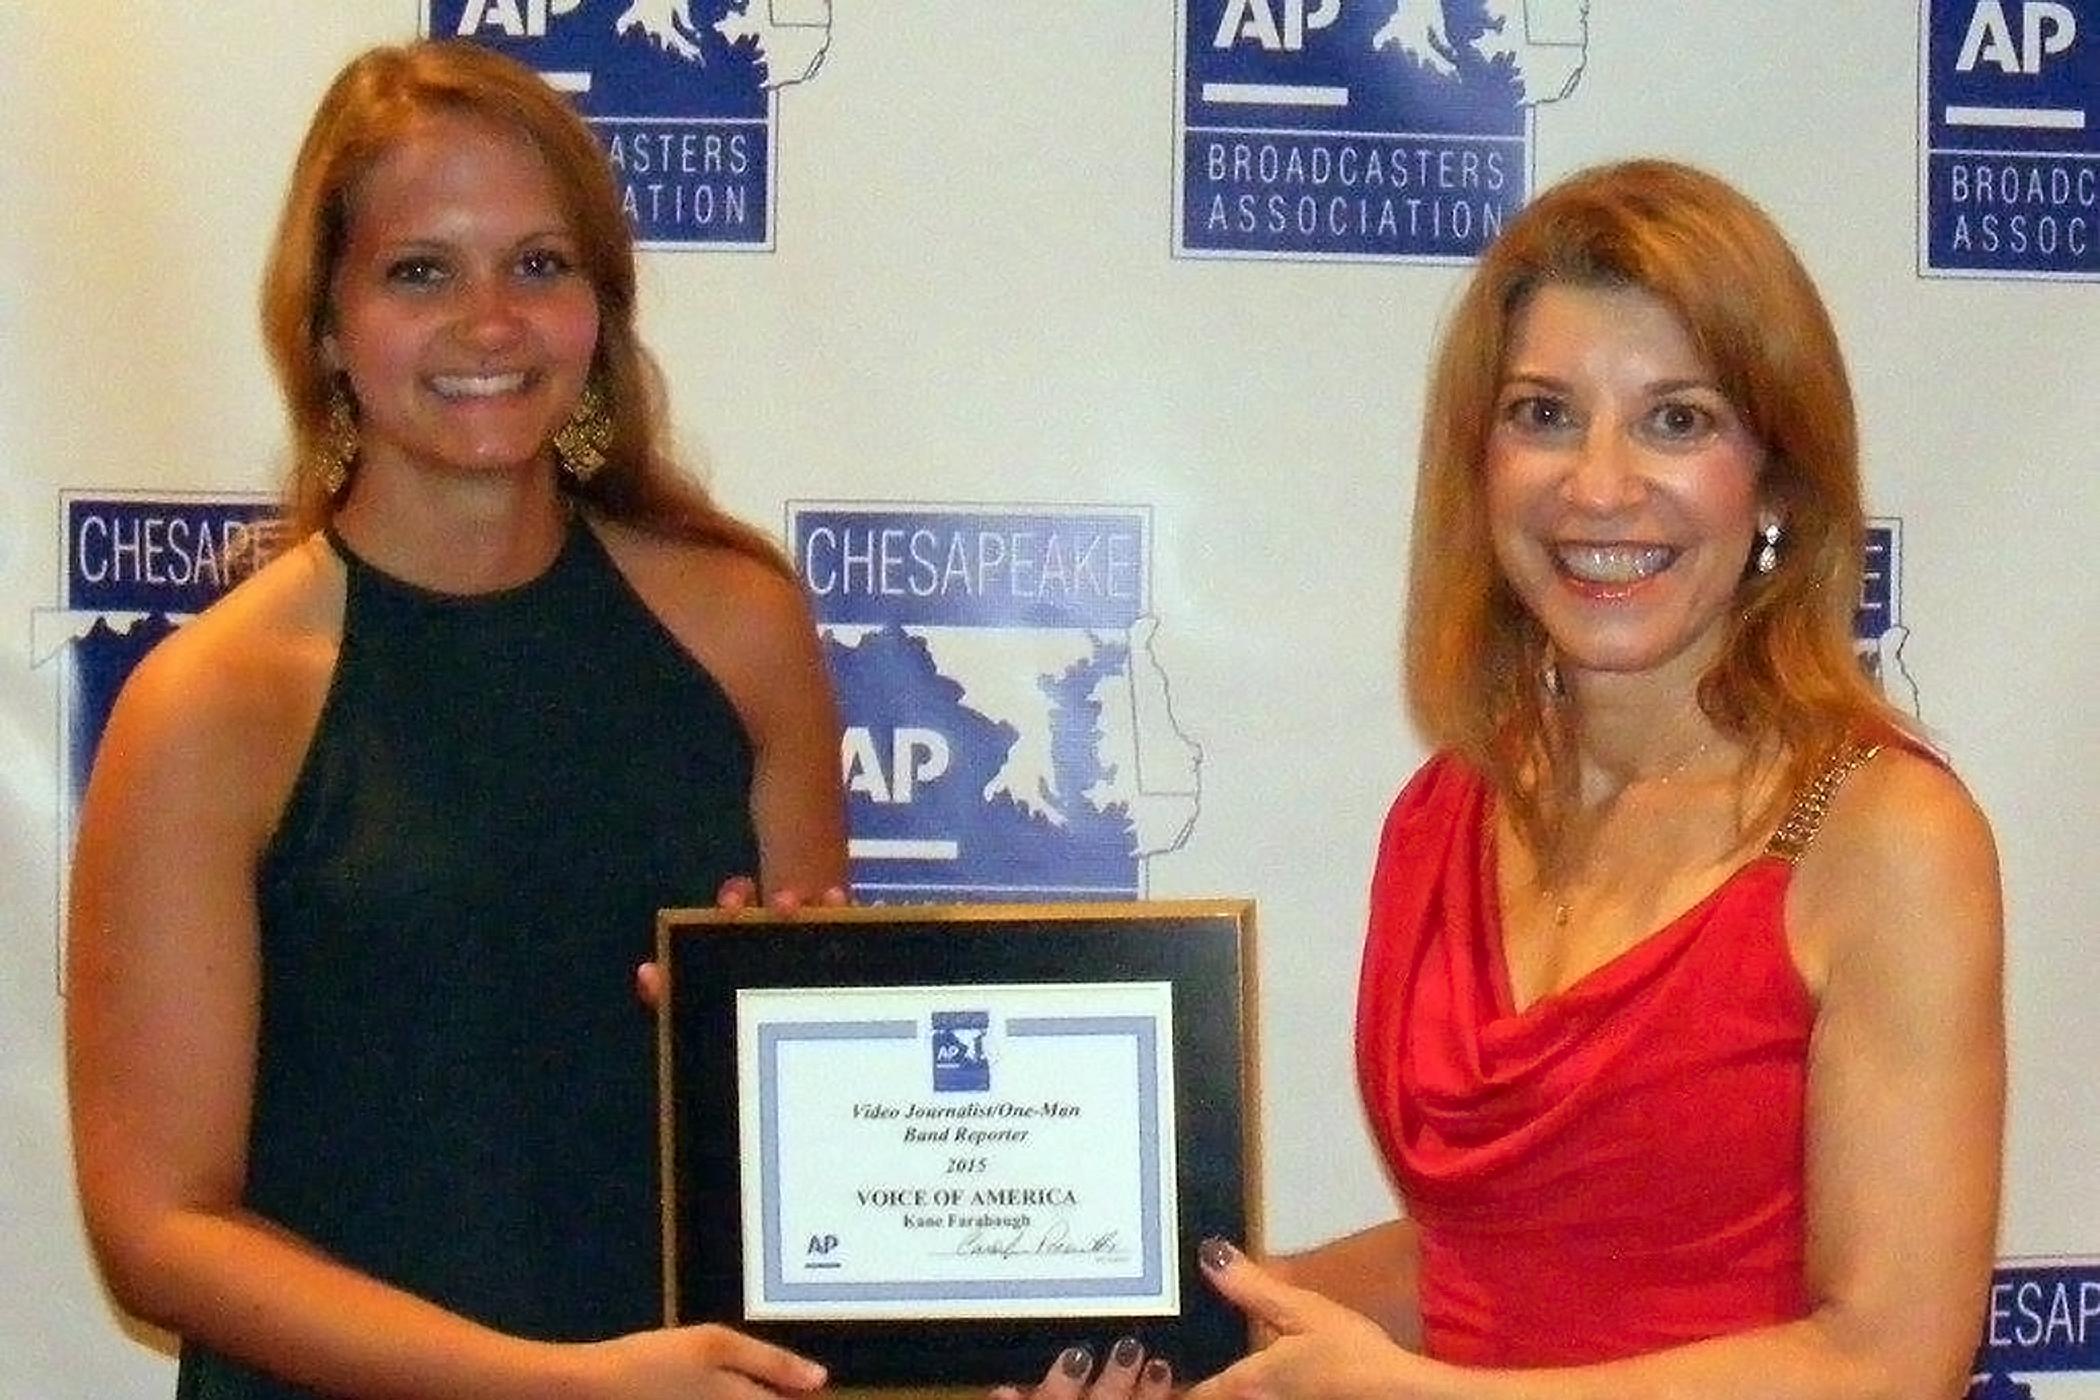 VOA reporter wins award for best video journalist